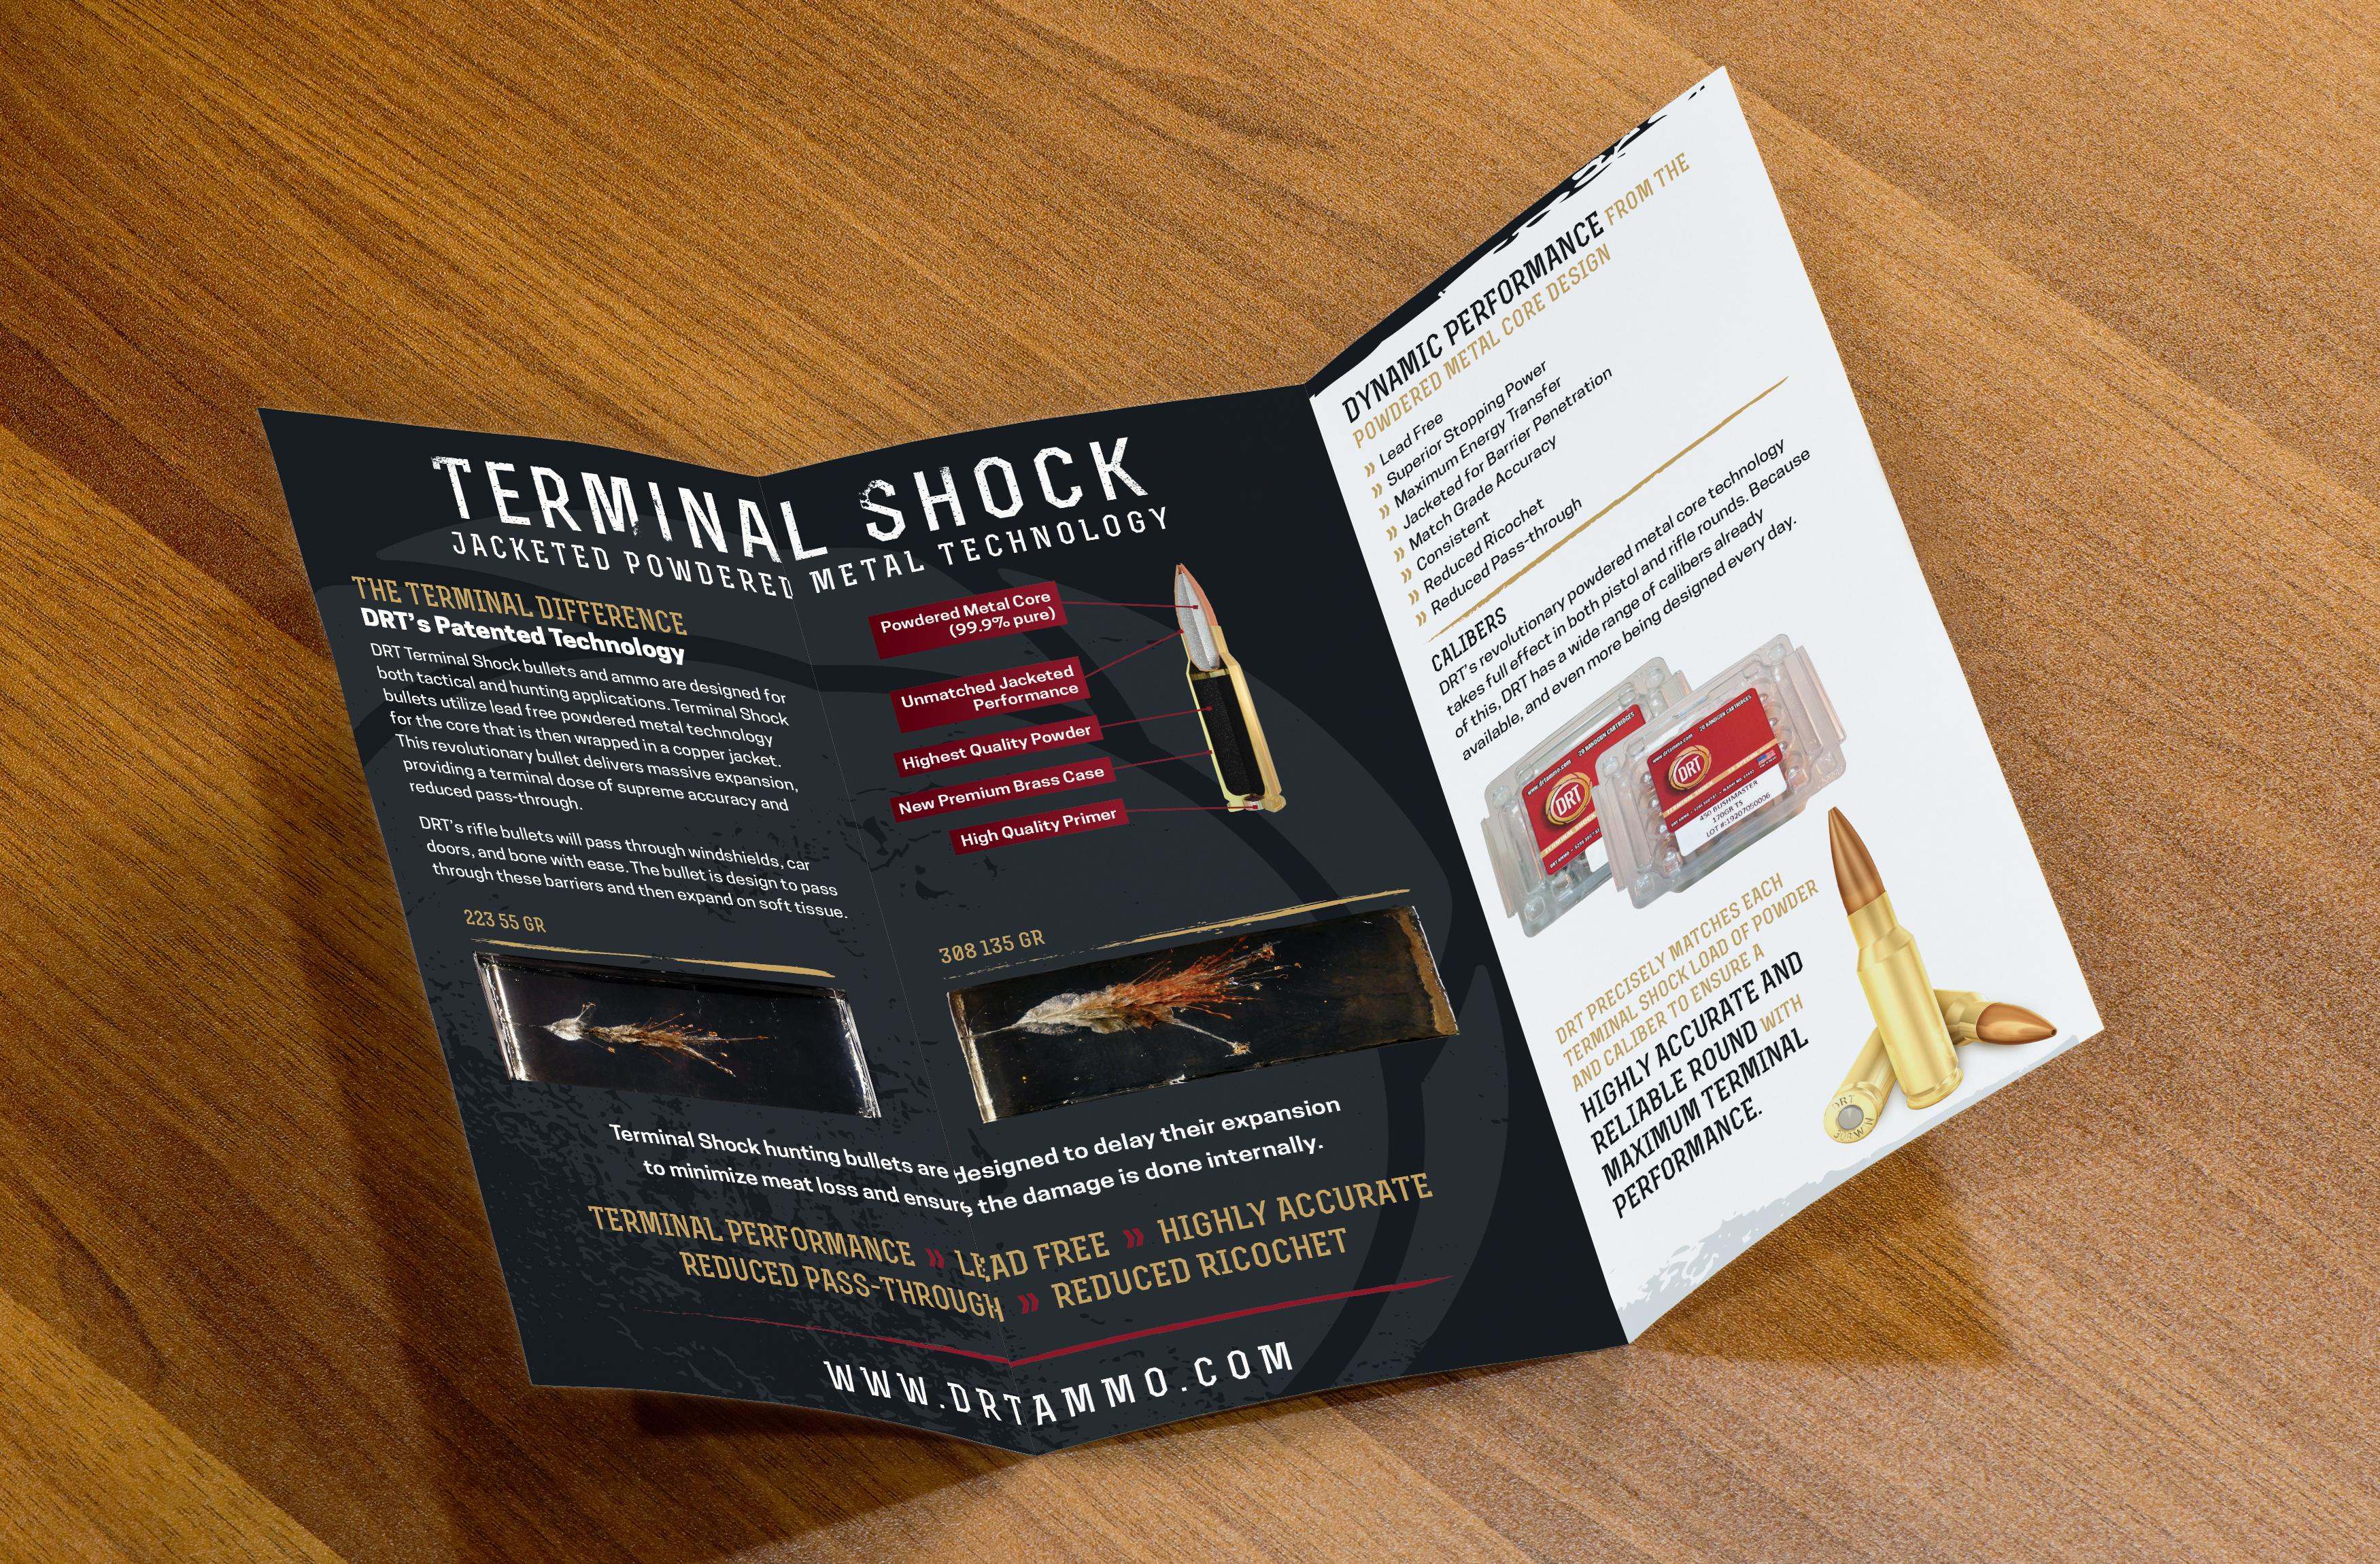 DRT ammunition tri-fold brochure: inside